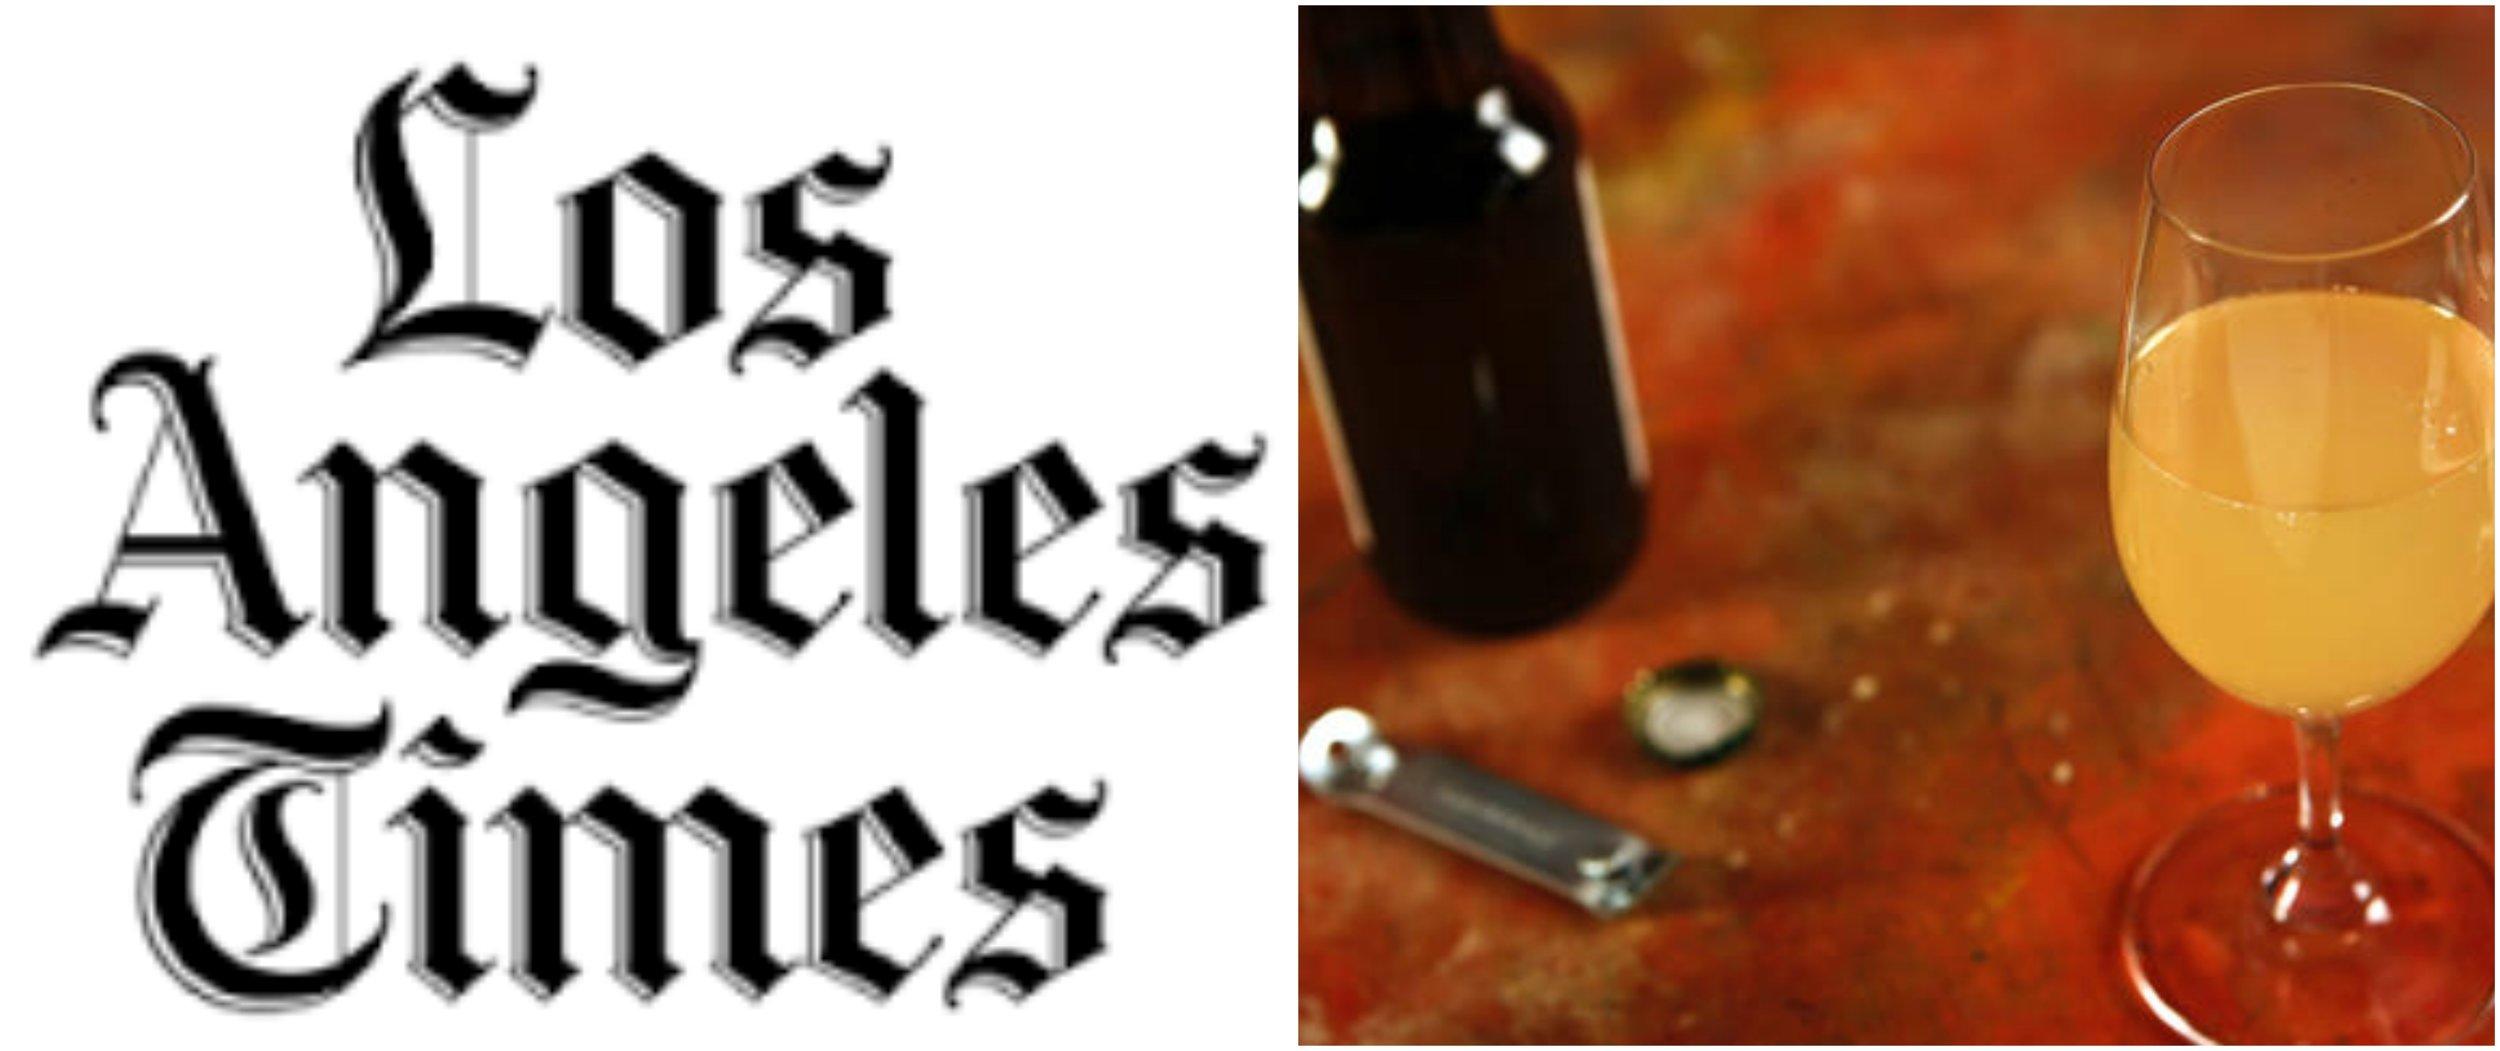 CIder.LA.Times.jpg